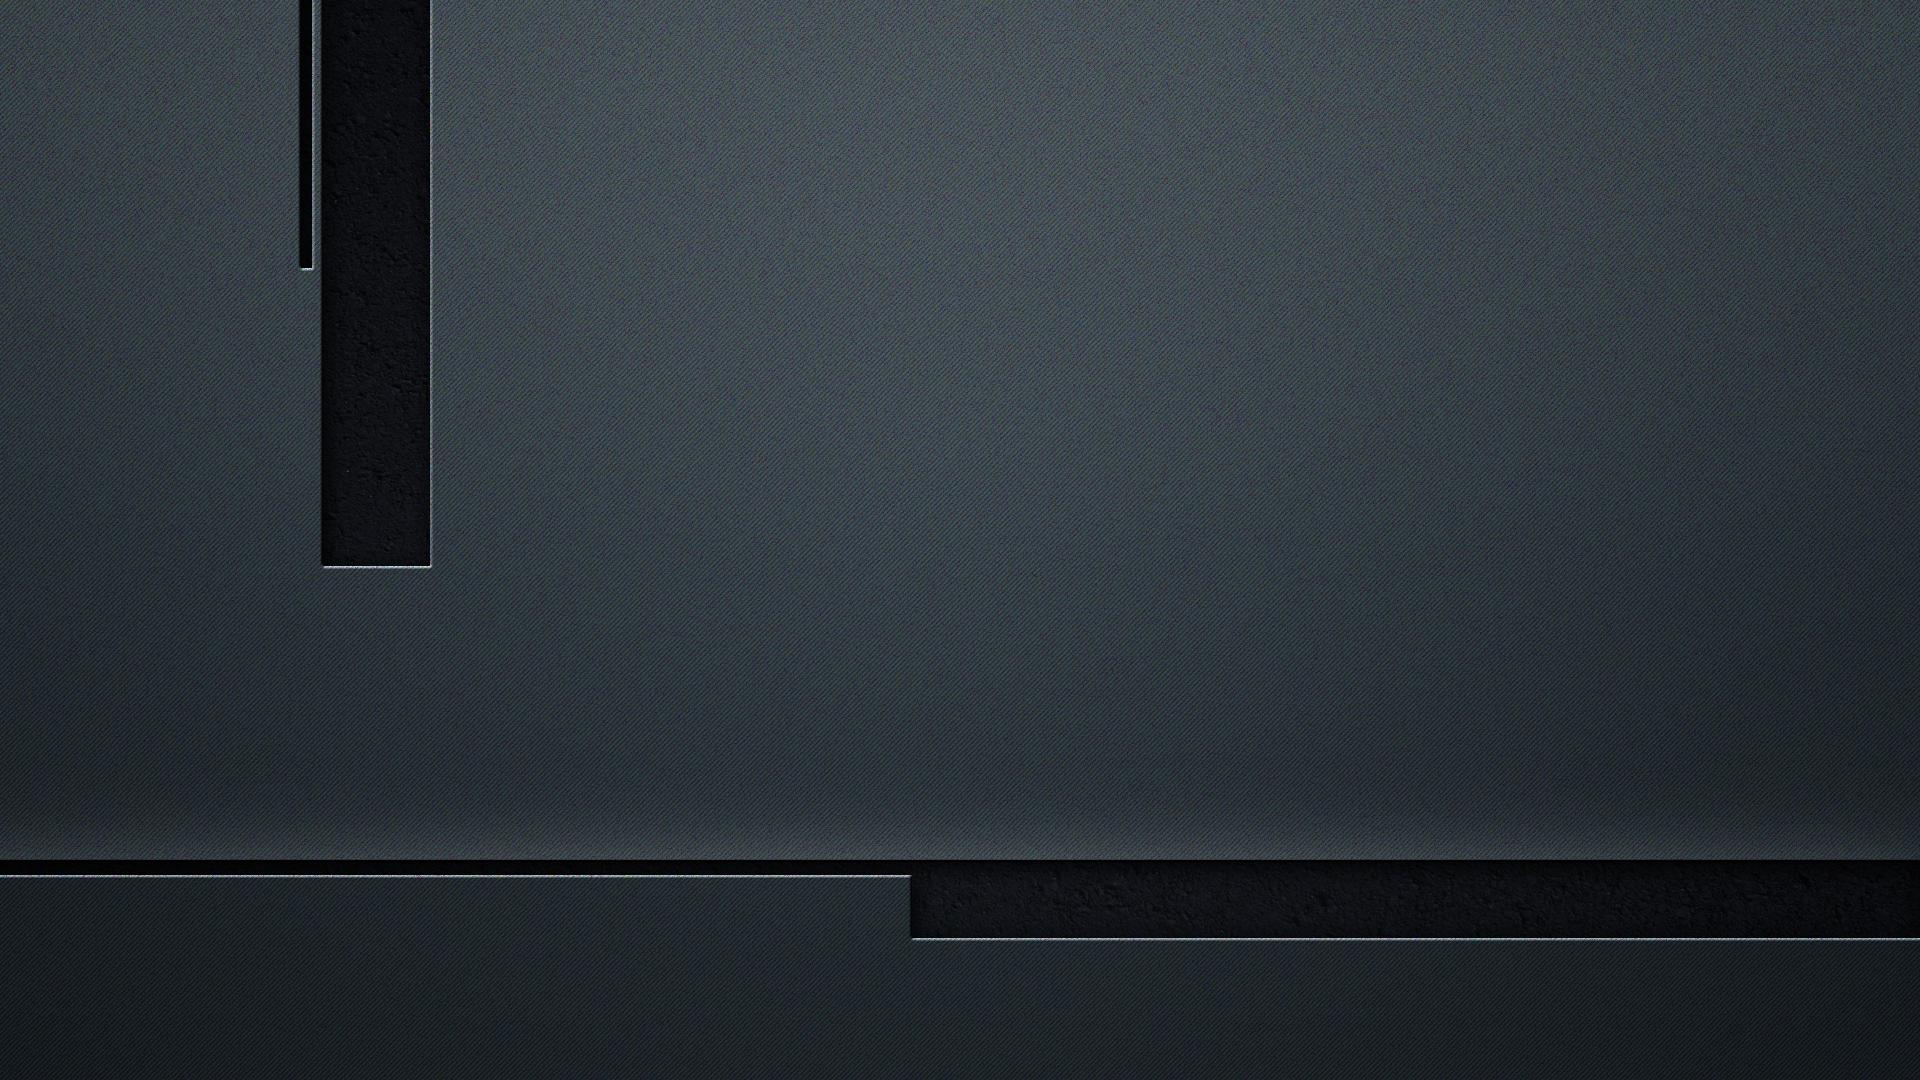 Desktop Background 1920x1080 by MrOrangebay 1920x1080